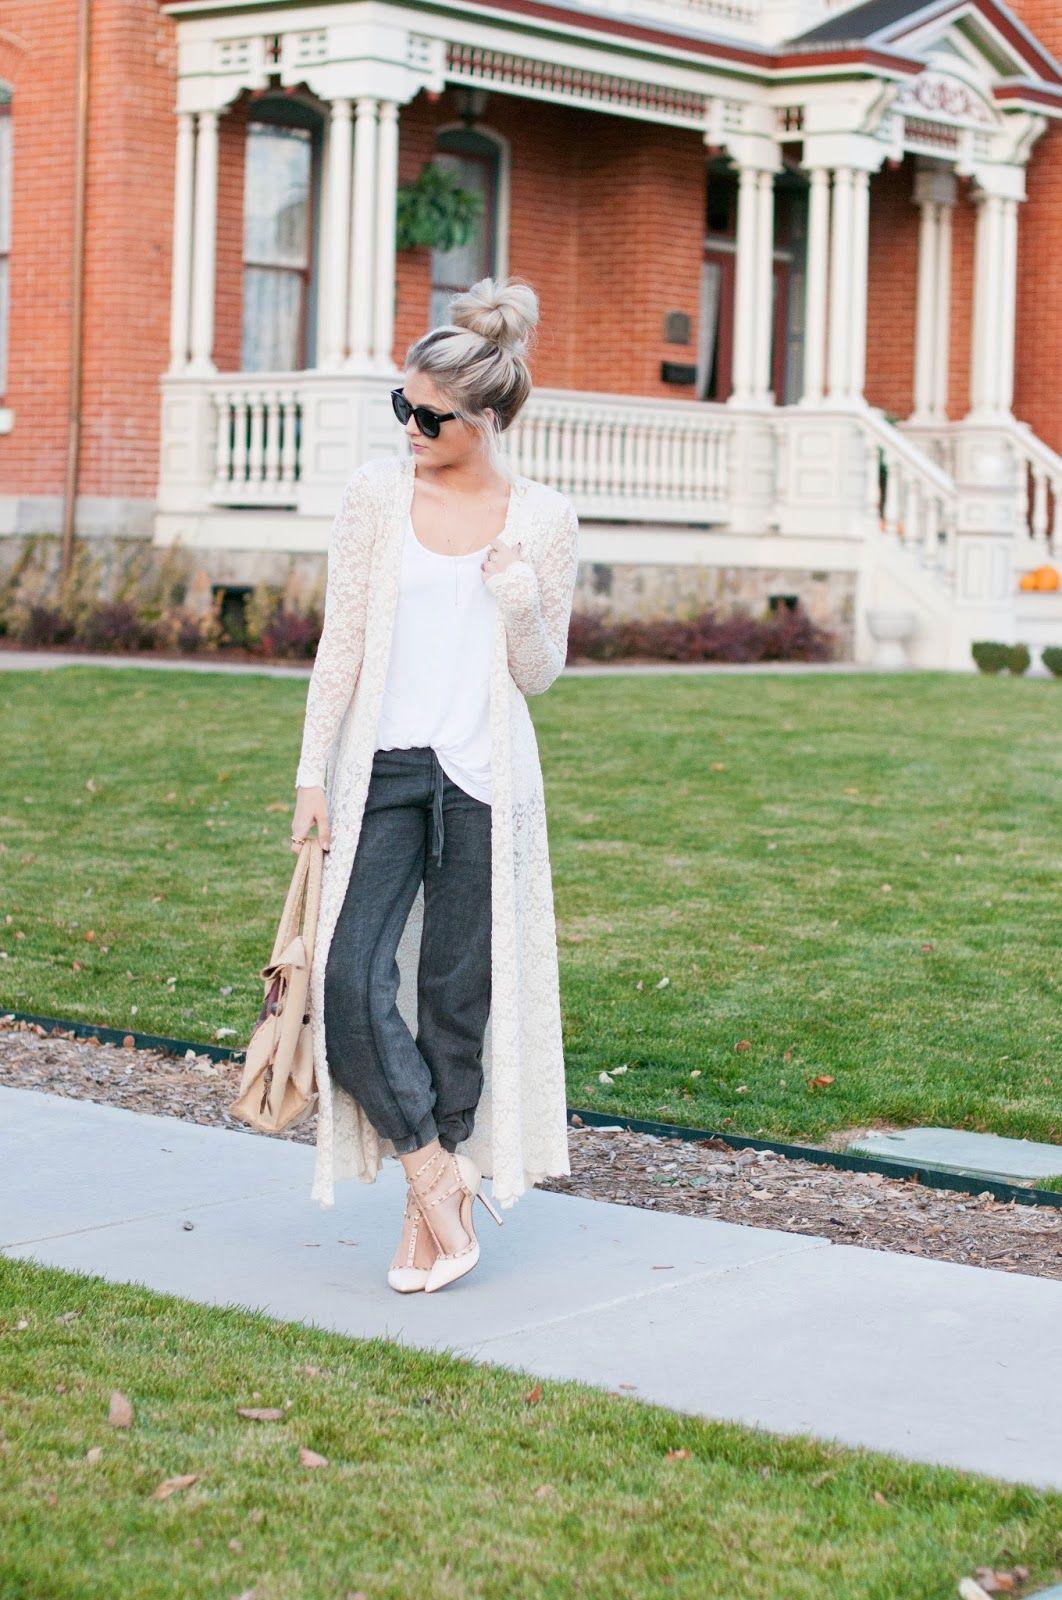 Cara Loren in ShopRiffraff's Cream Long Lace Kimono Cardigan ...